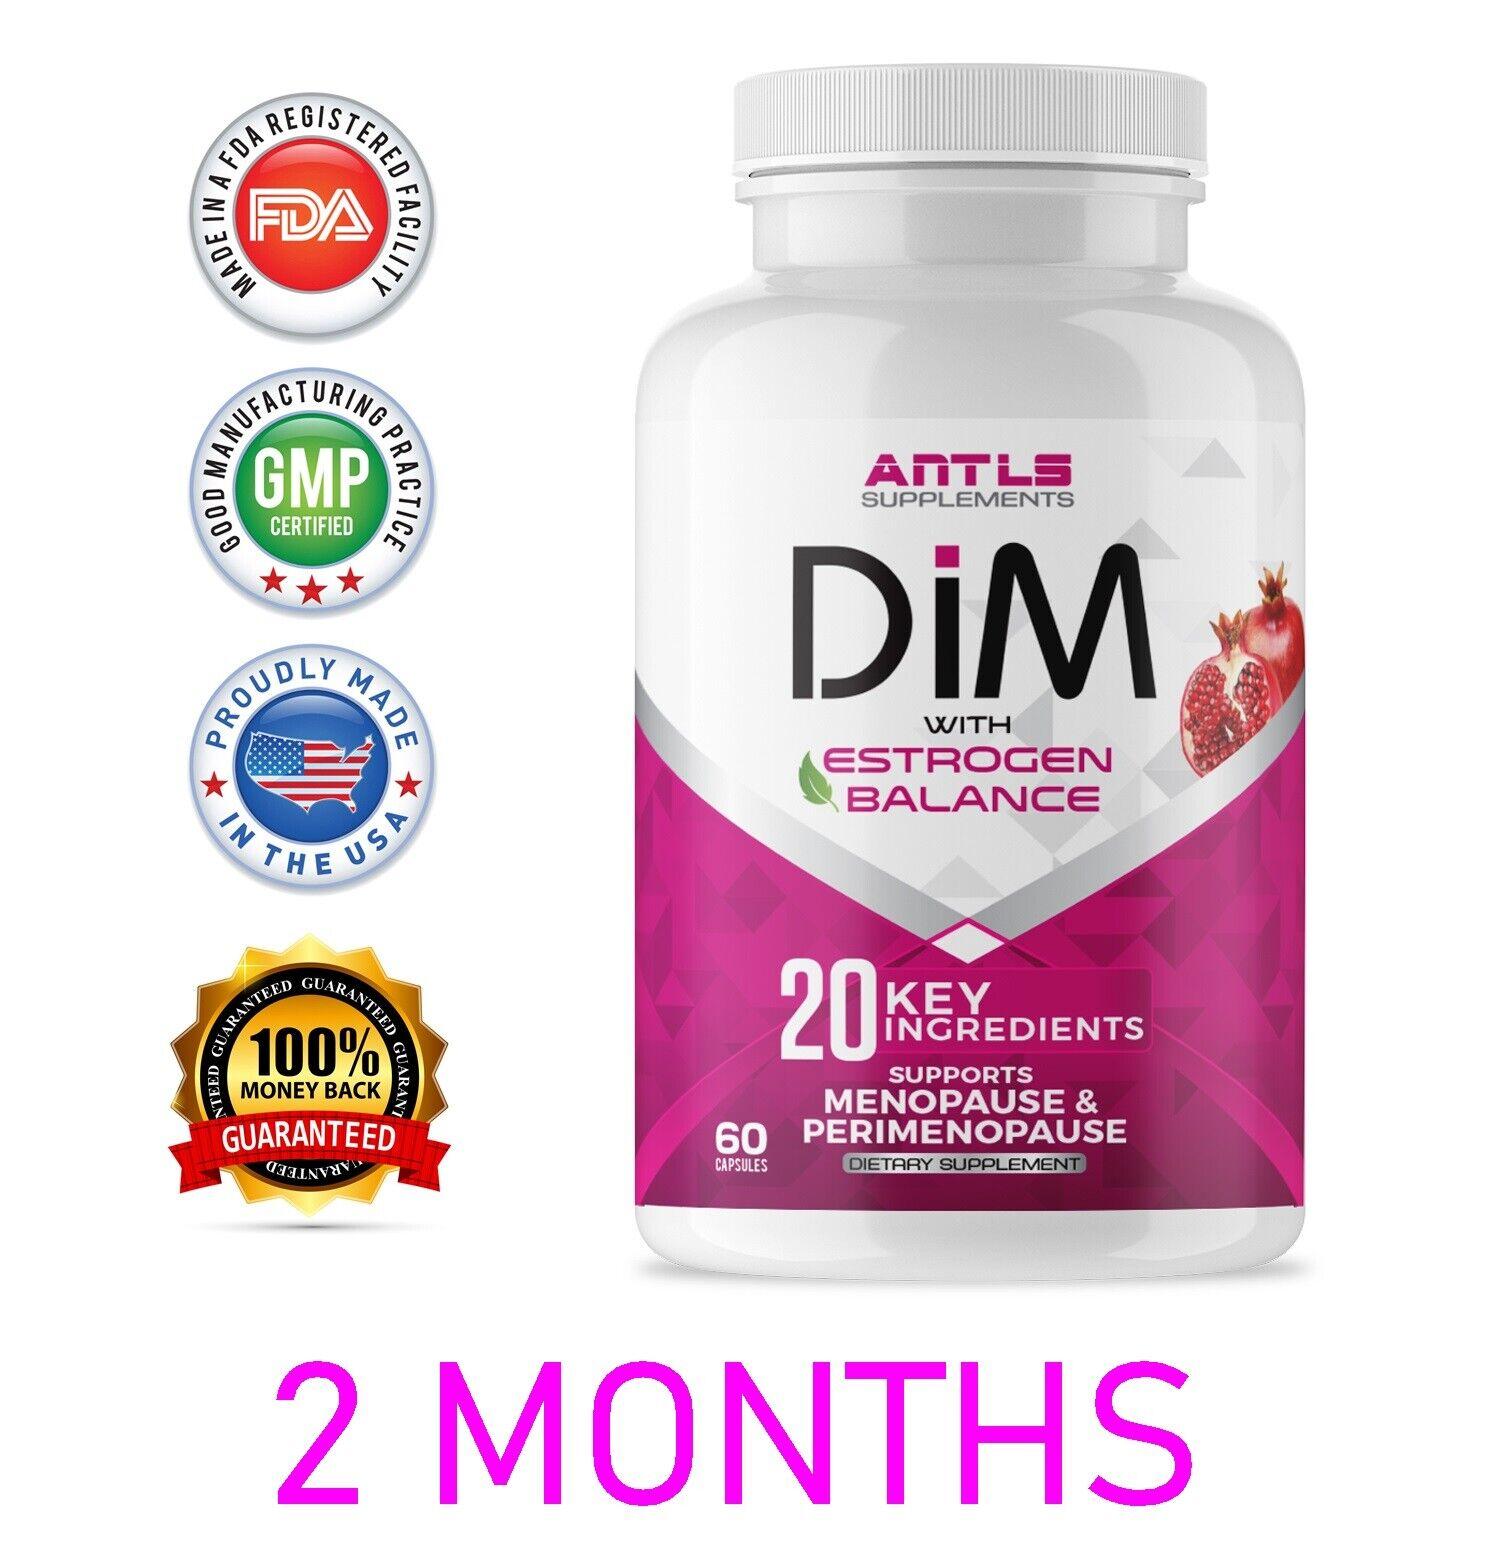 Dim Diet Pills-Weight Loss, Fat Burner Supplement, Appetite Suppressant Capsules